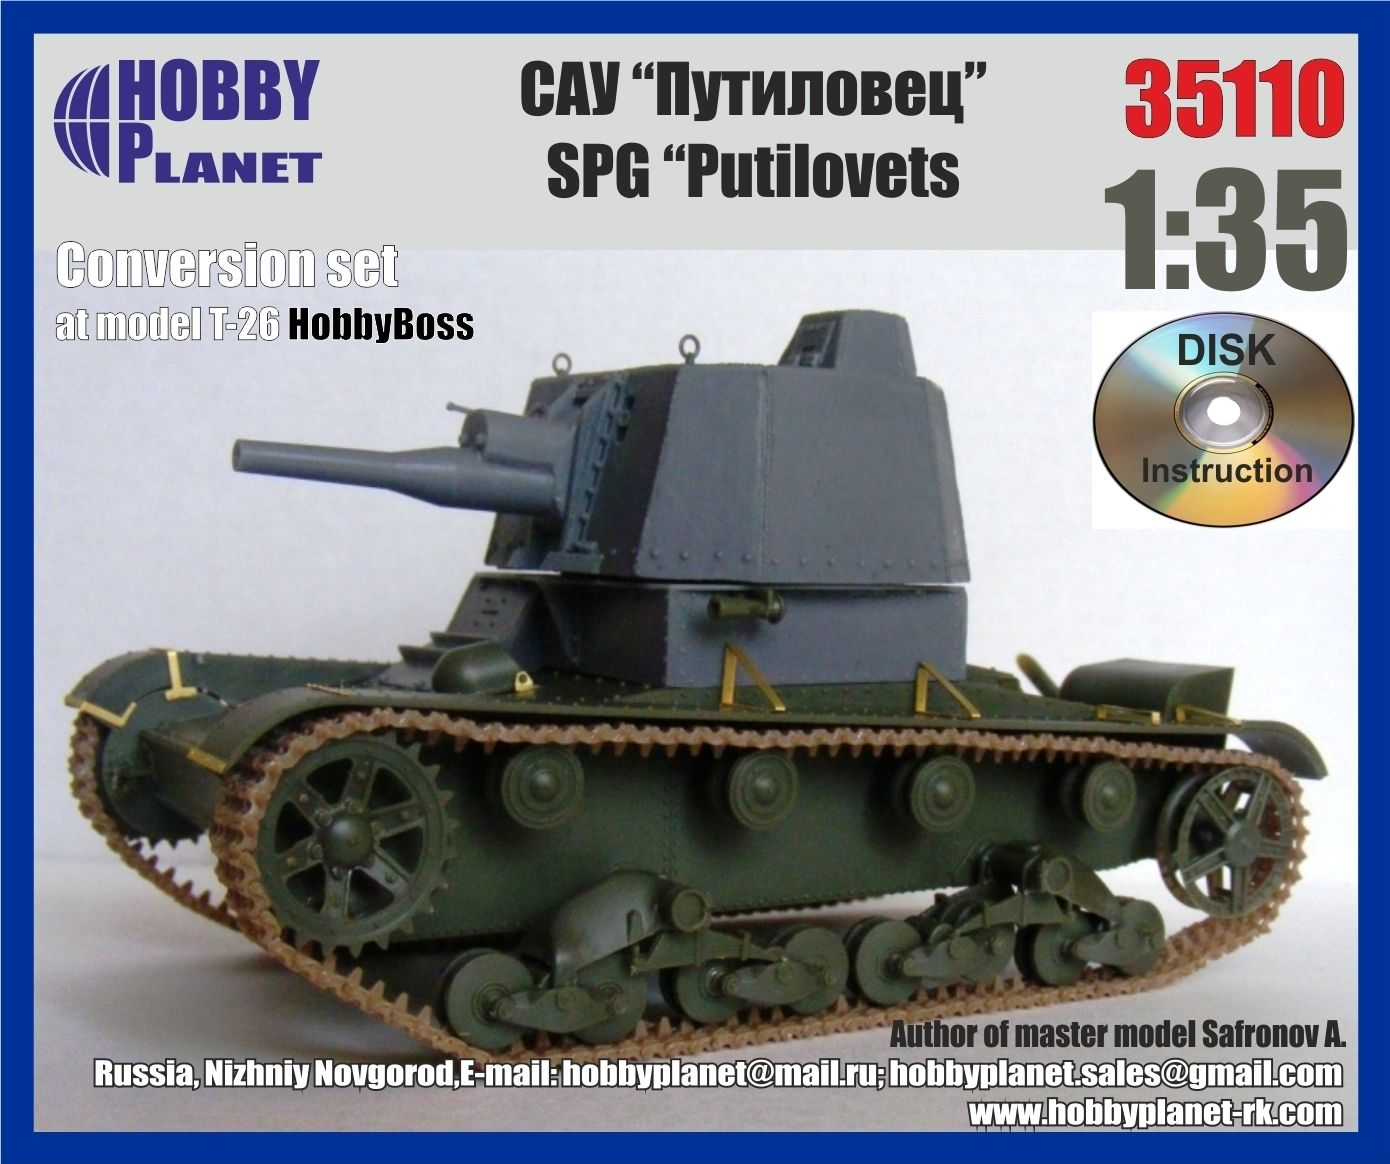 35110 Soviet SPG Putilovec Image